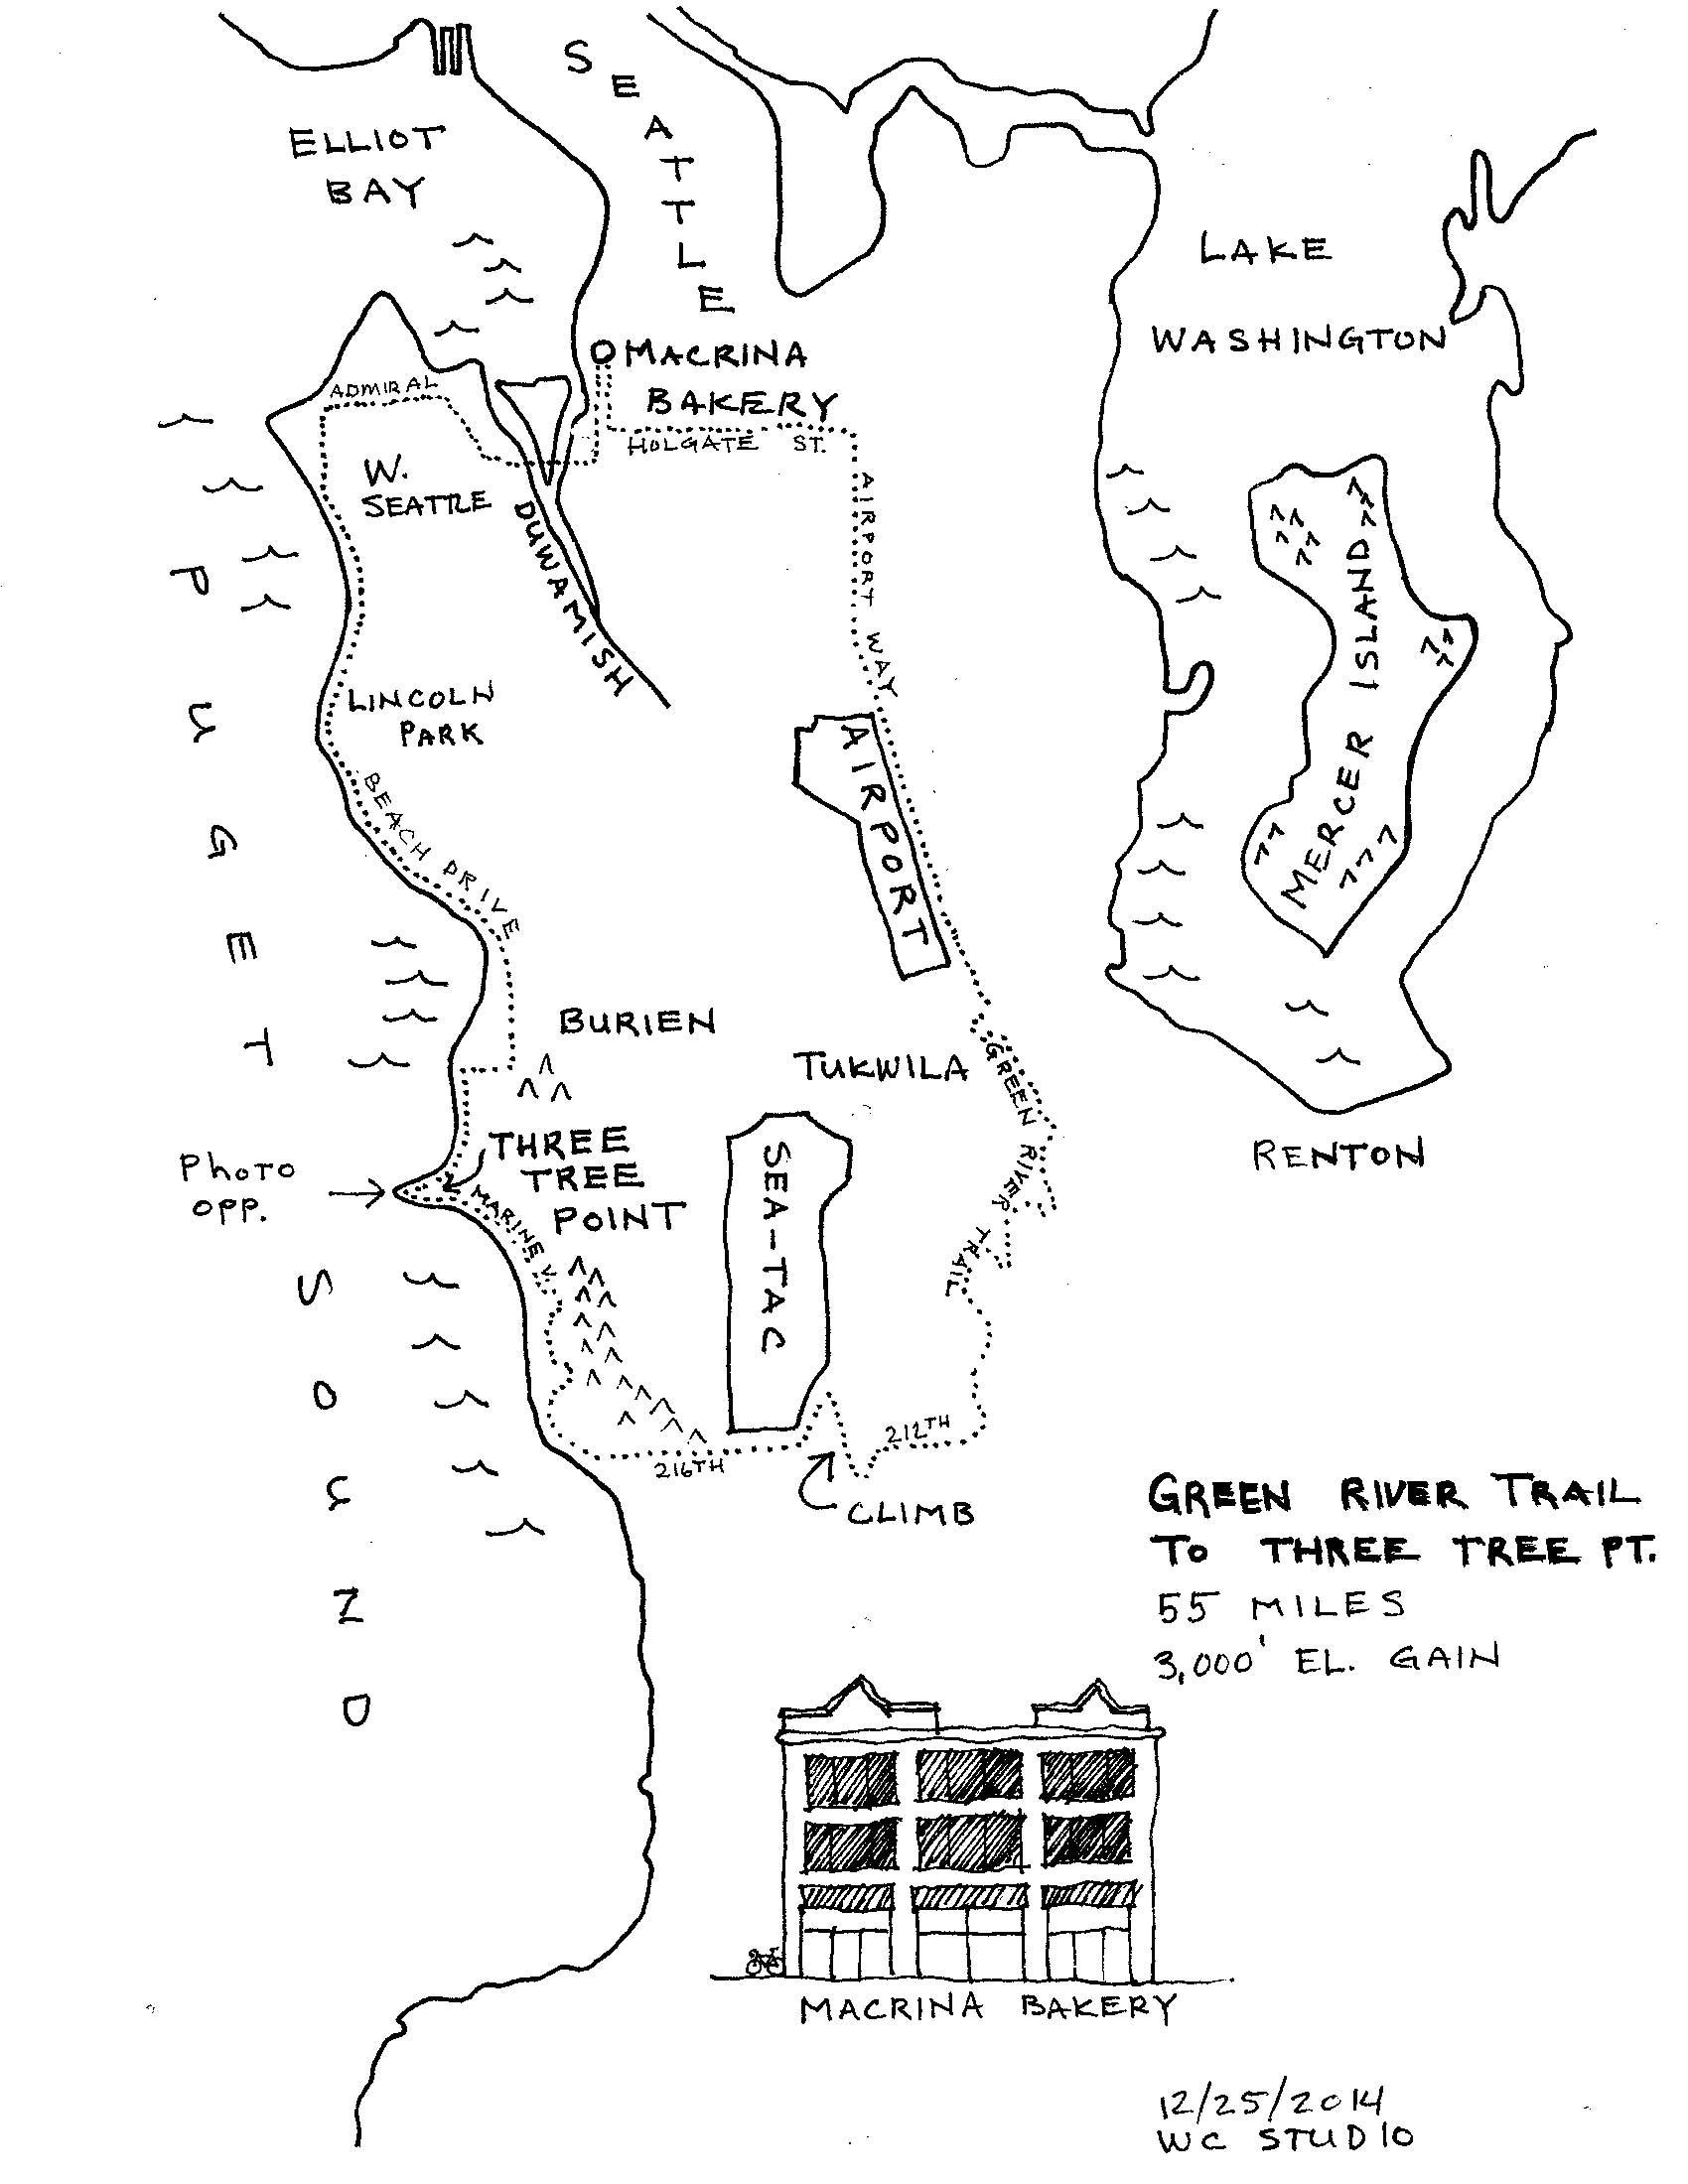 Green River Trail Ride Map.jpg